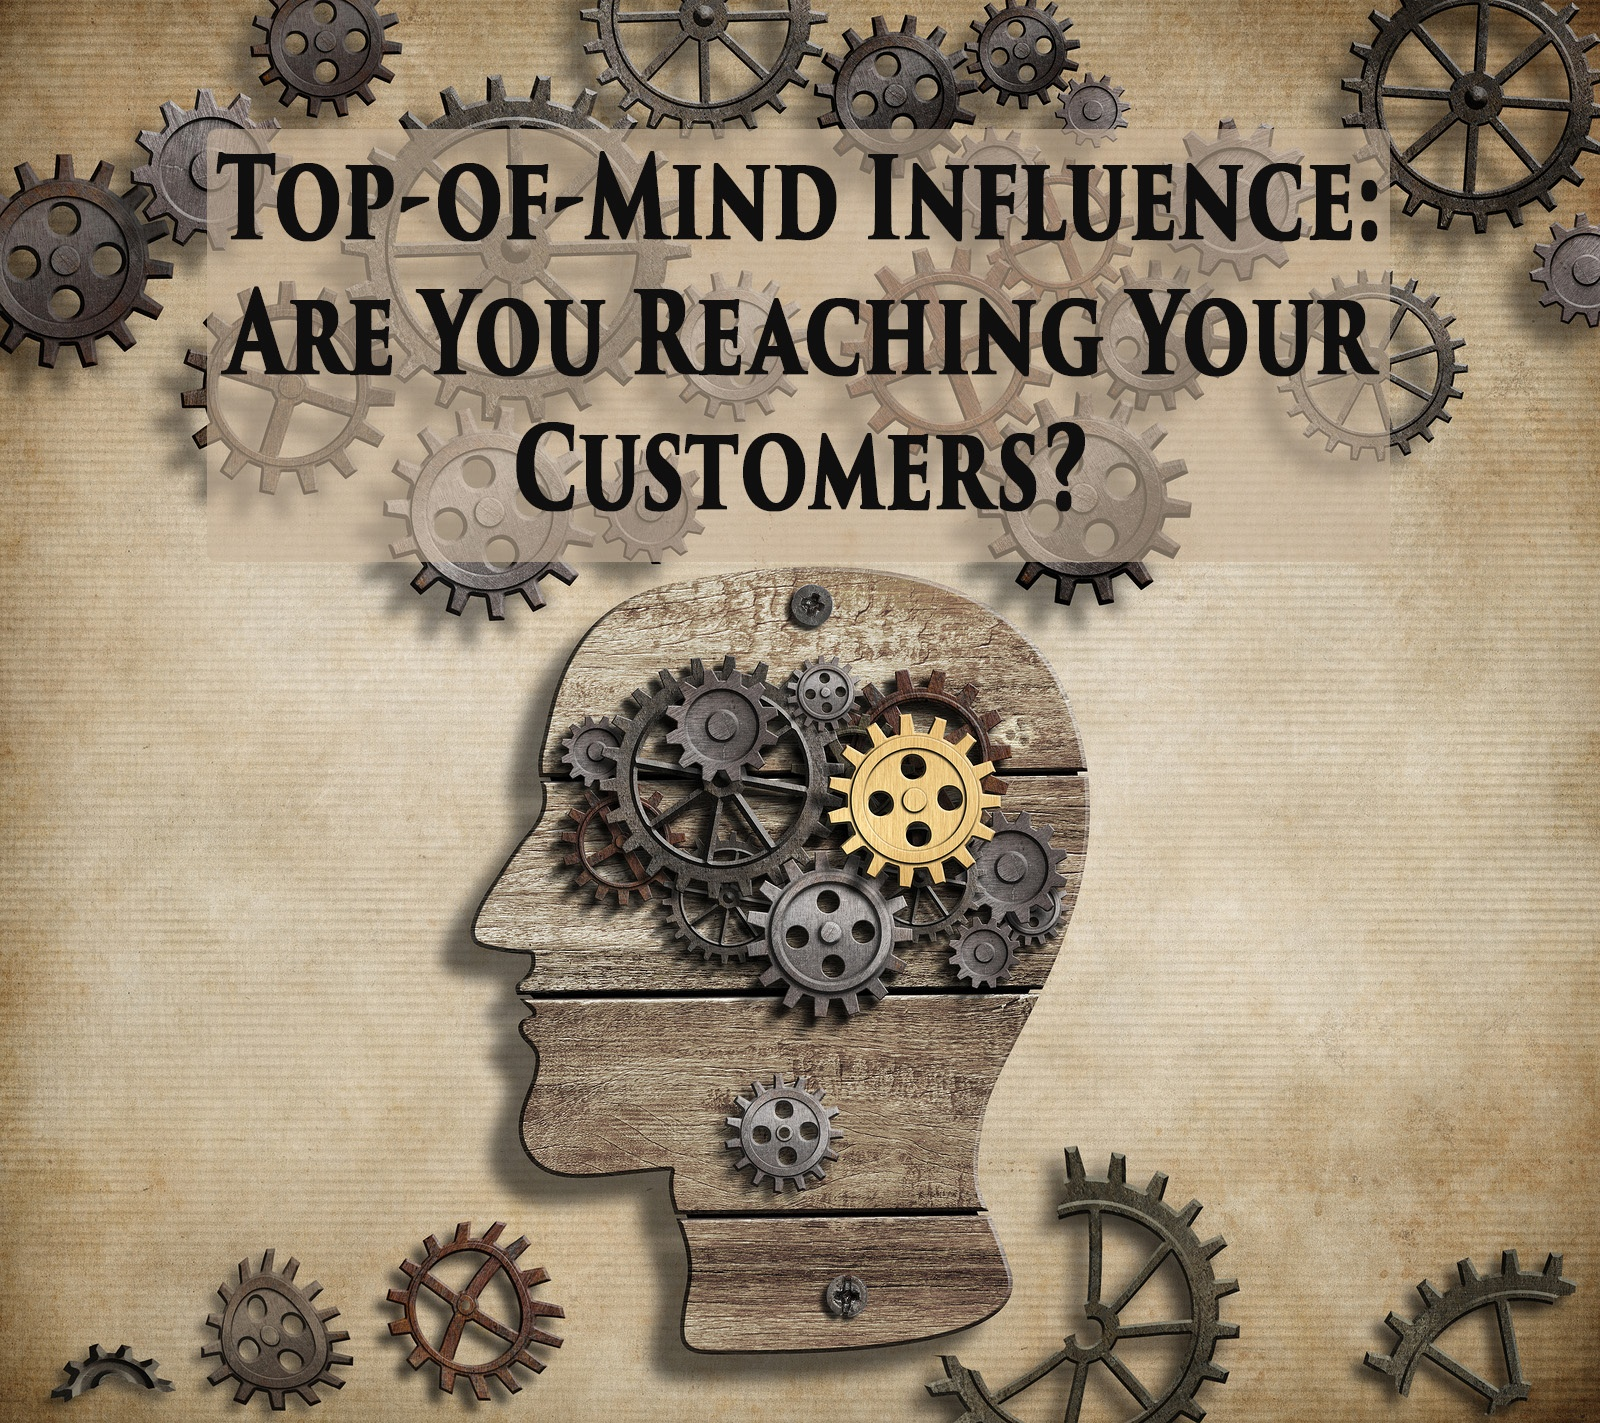 top-of-mind_influence.jpg